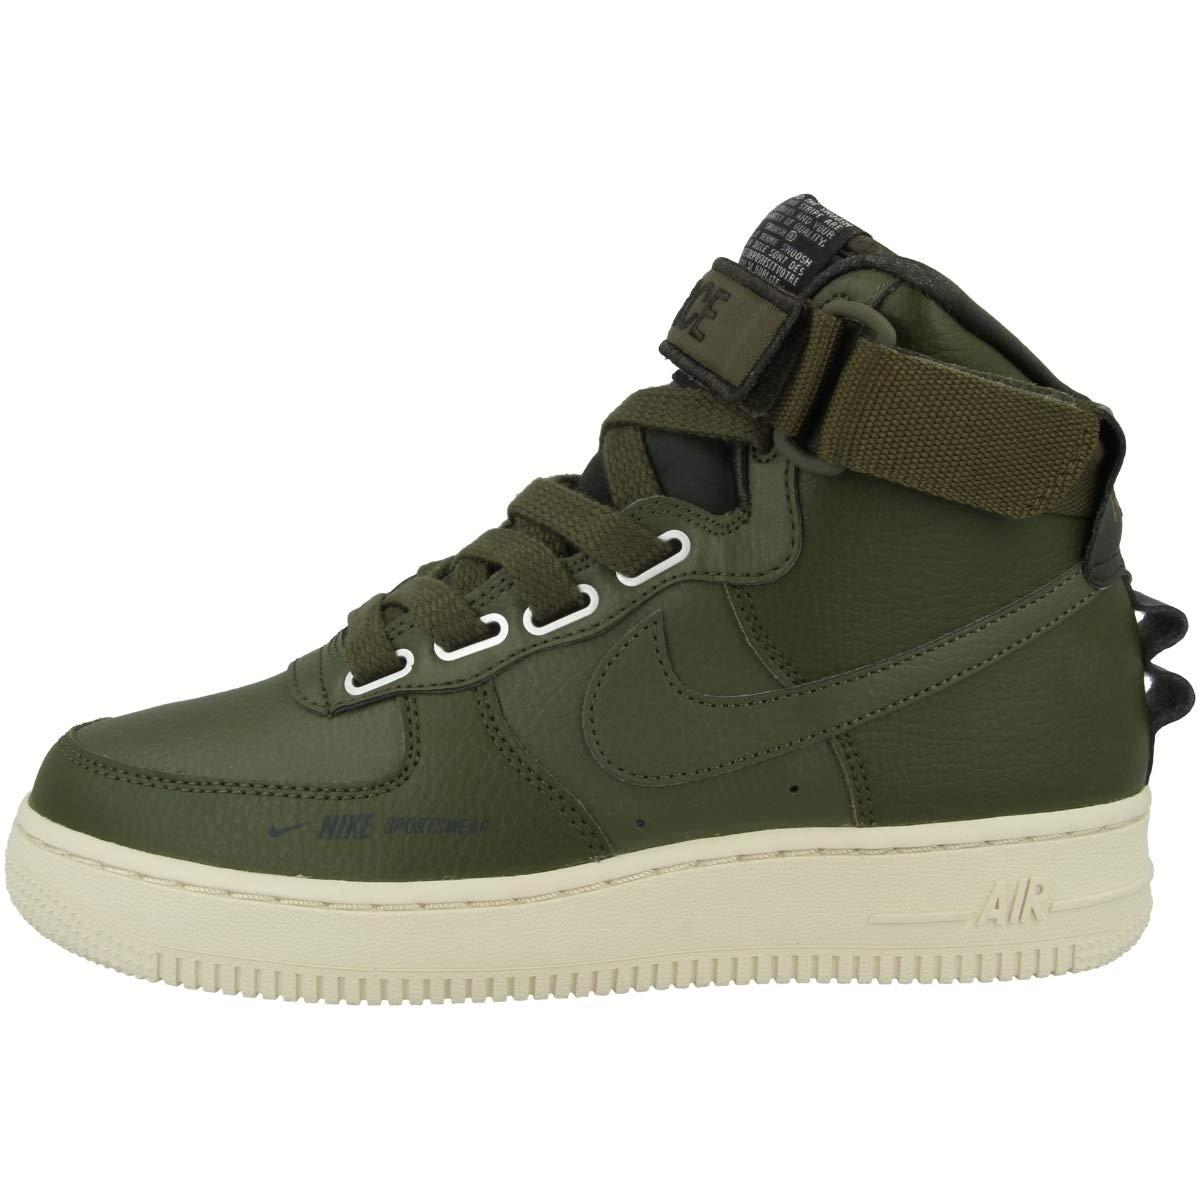 Buy Nike Air Force 1 Hi Utility Womens